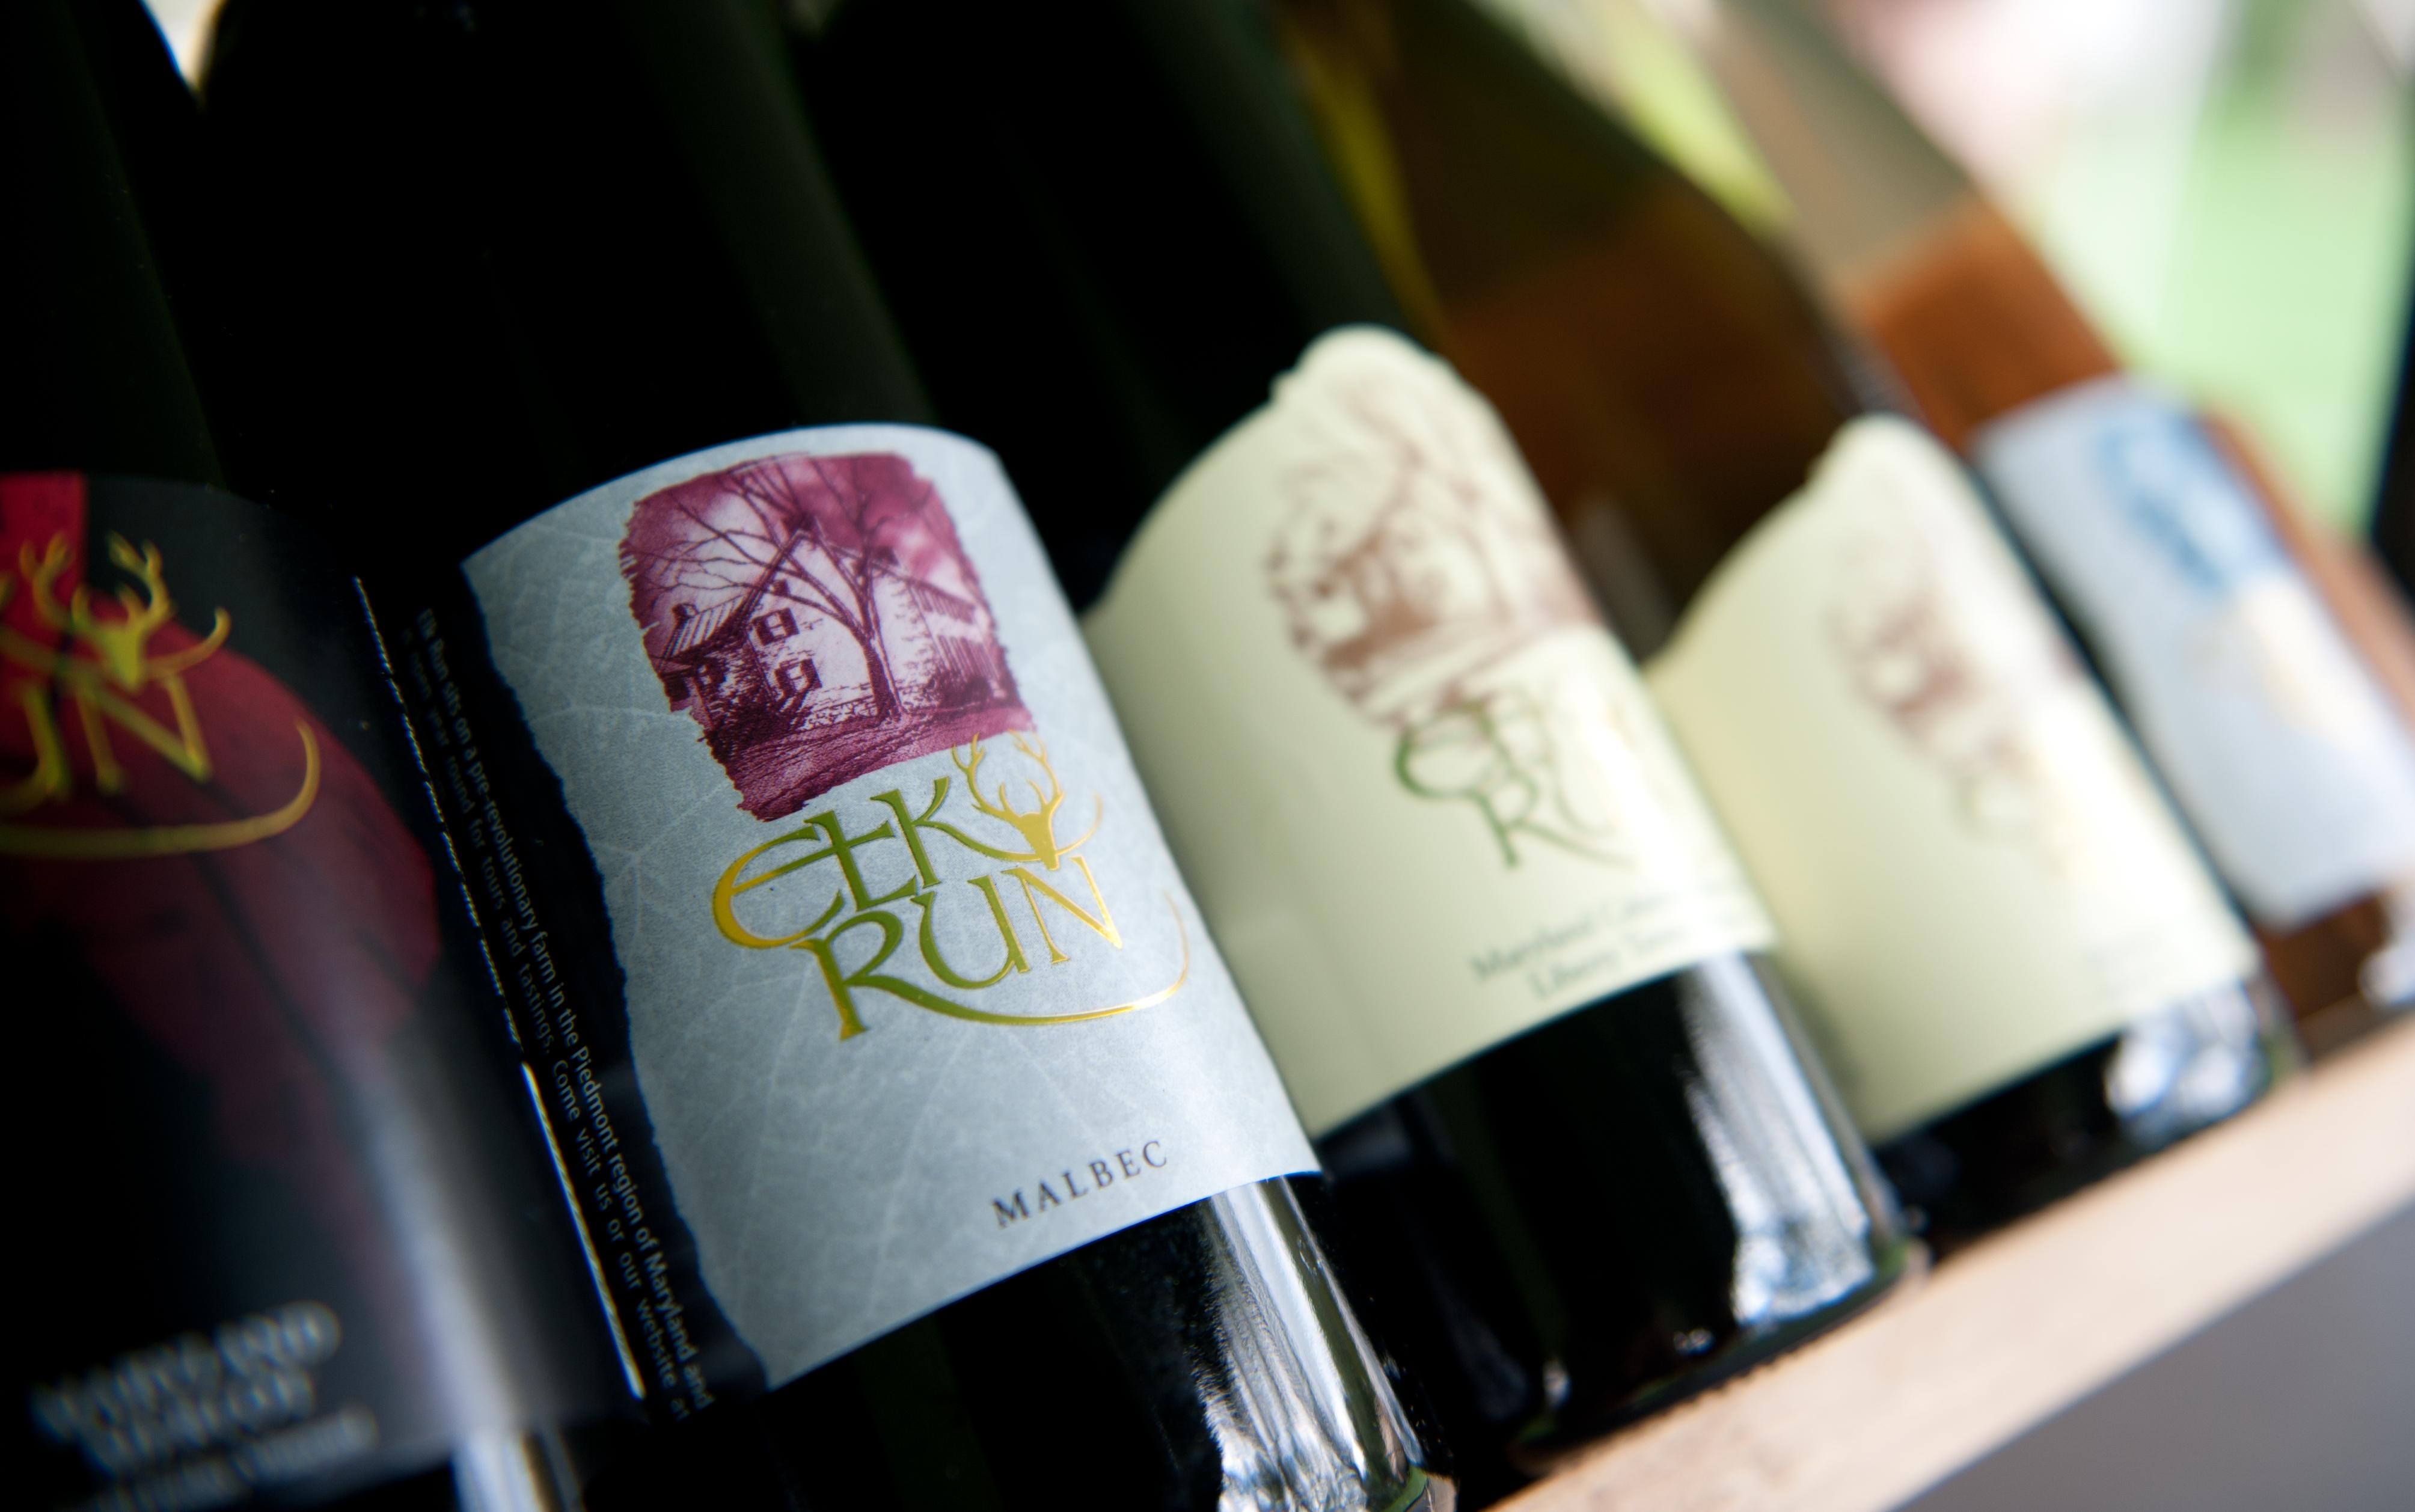 Wines from Elk Run Winery.